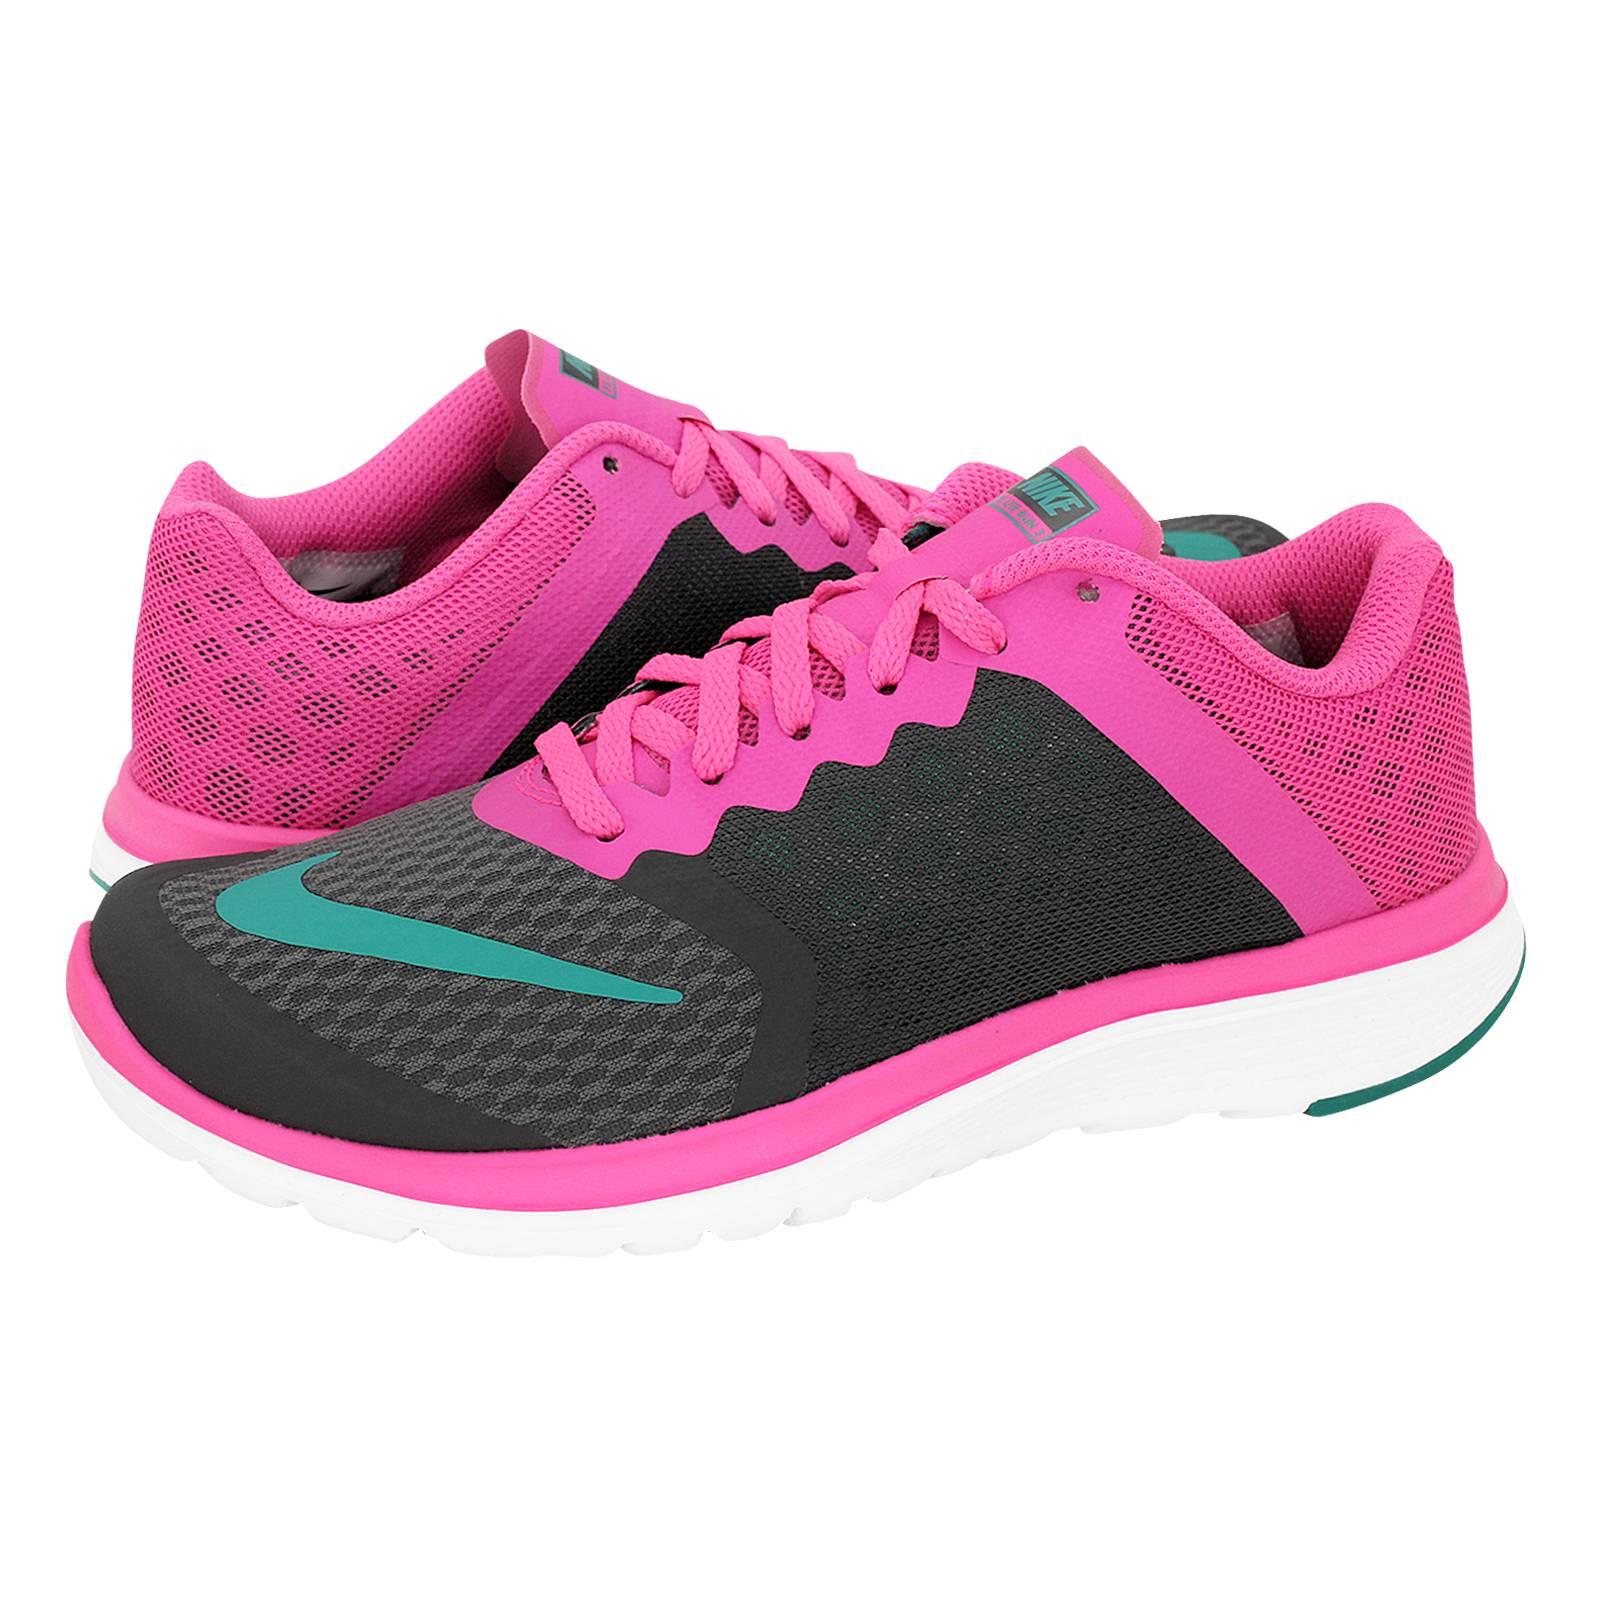 Nike FS Lite Run 3 athletic shoes